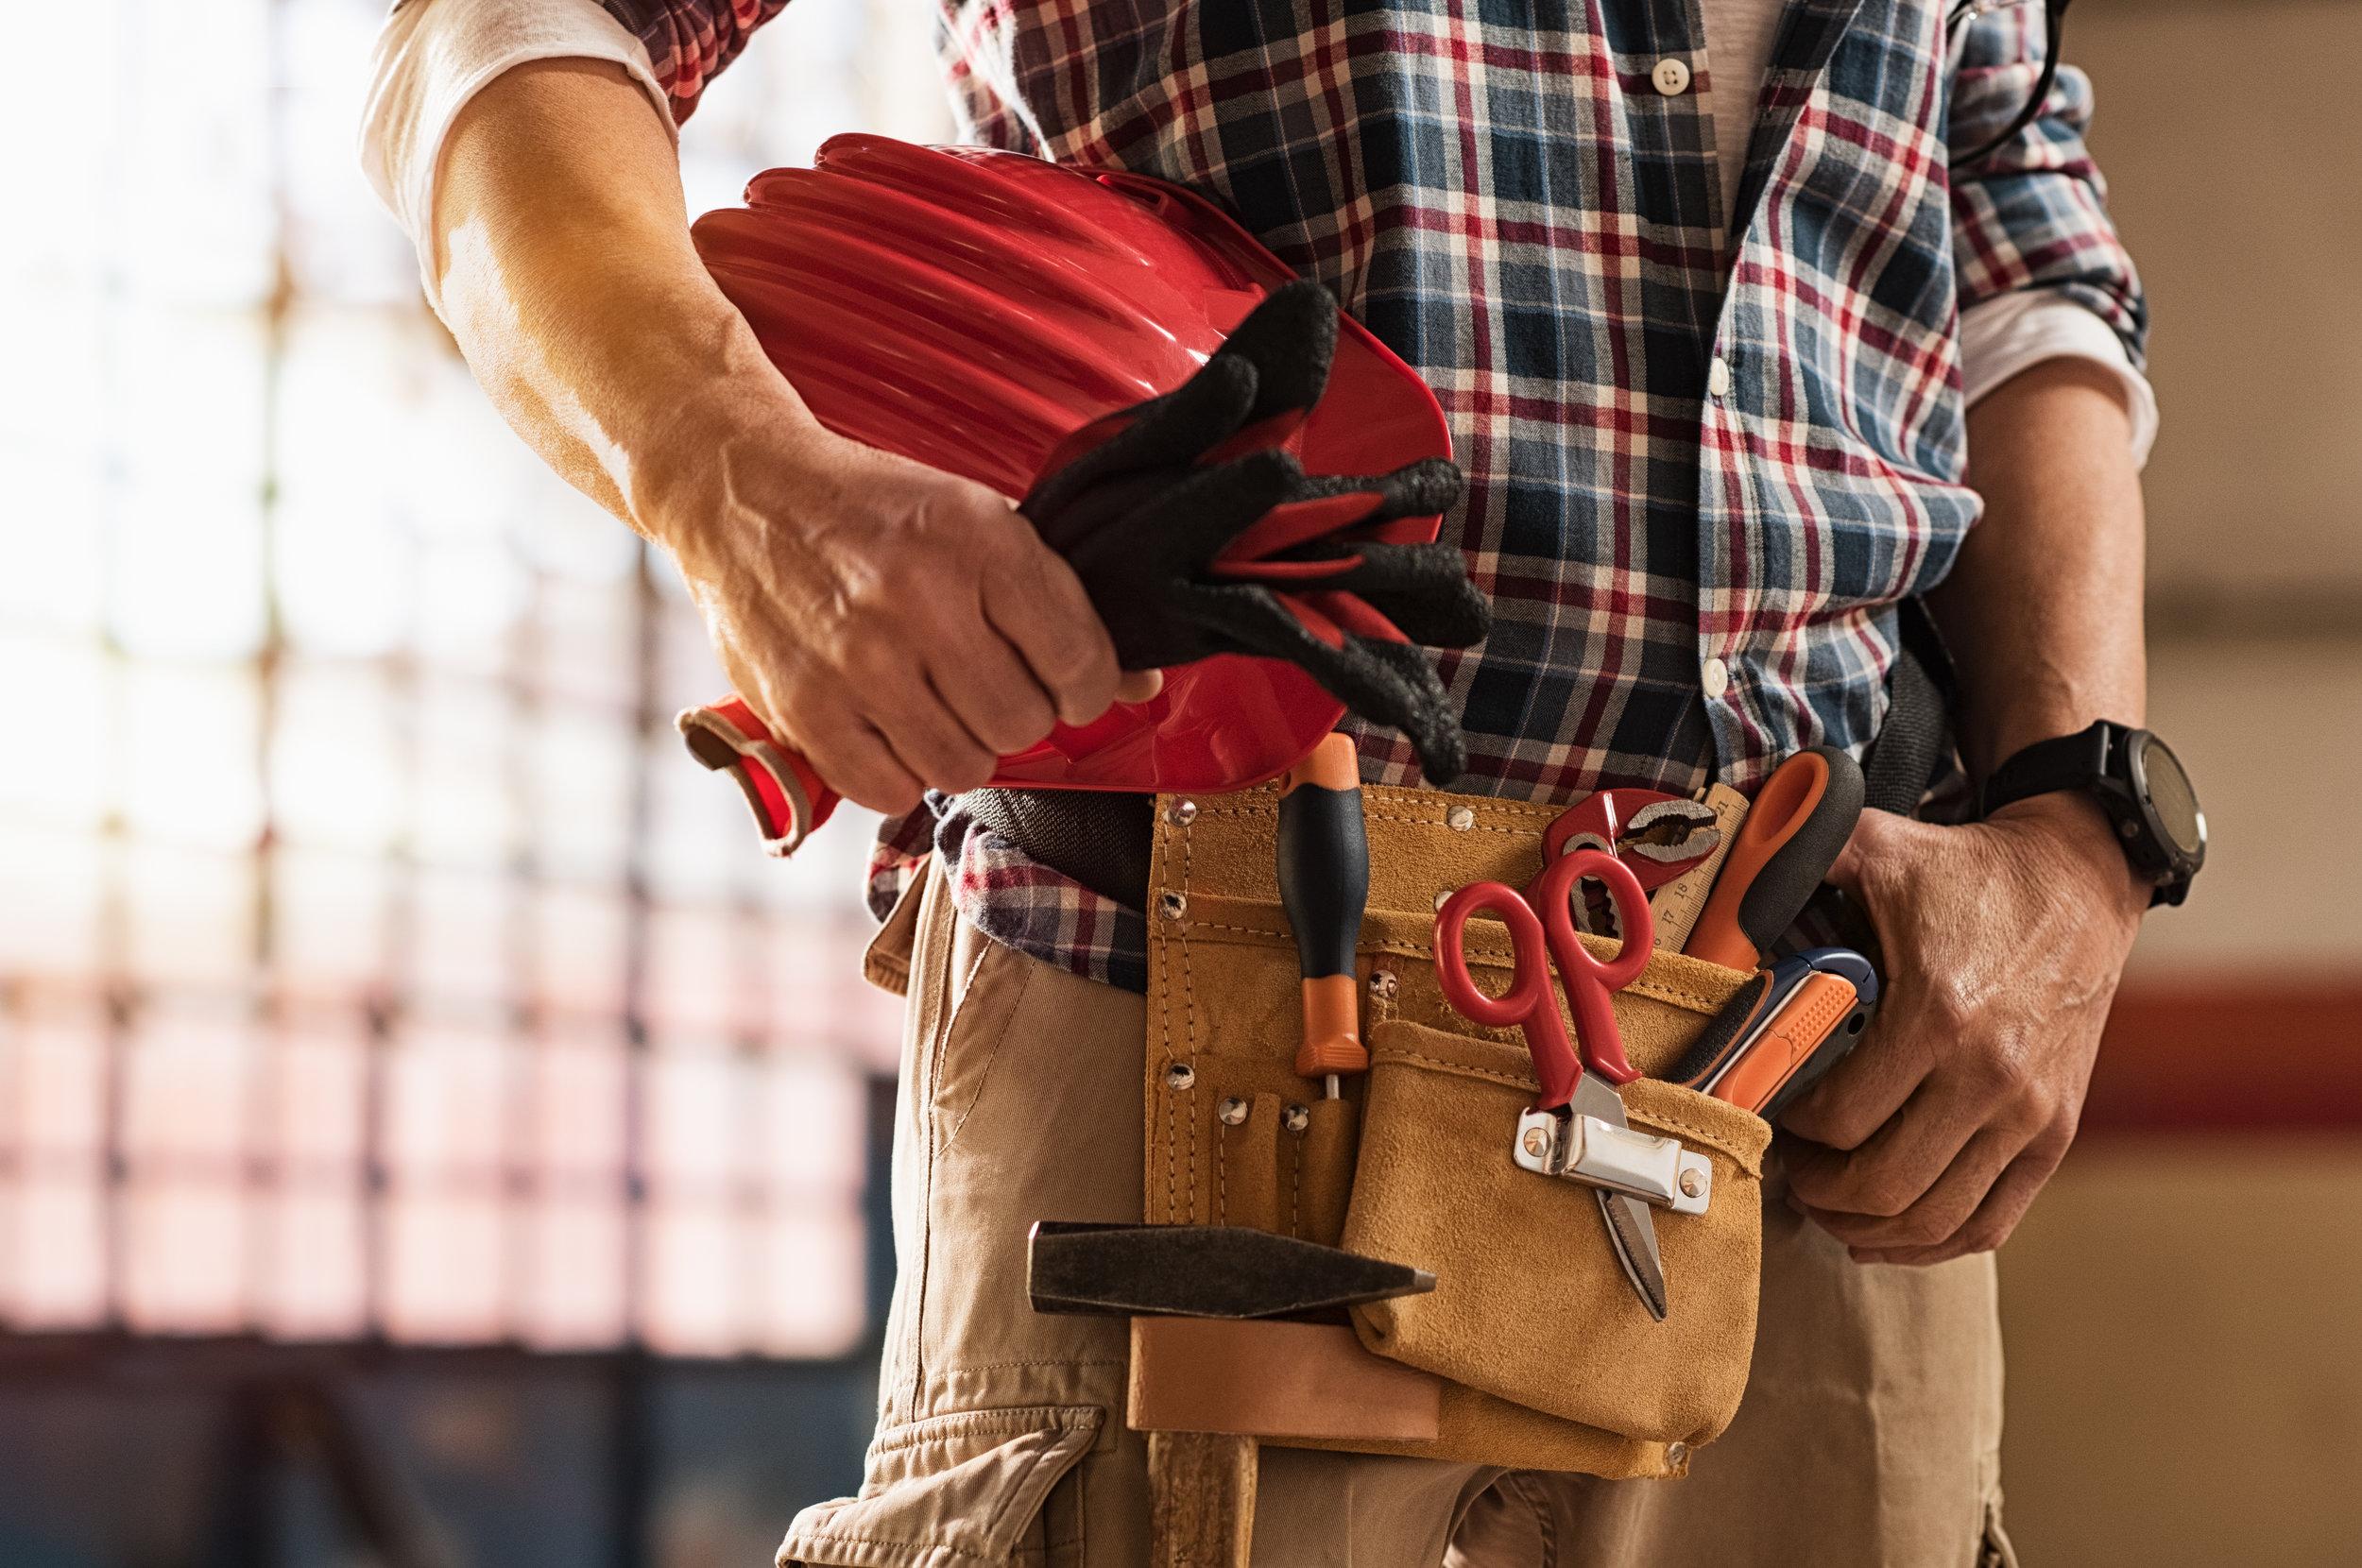 bigstock-Closeup-of-bricklayer-hands-ho-230406682.jpg